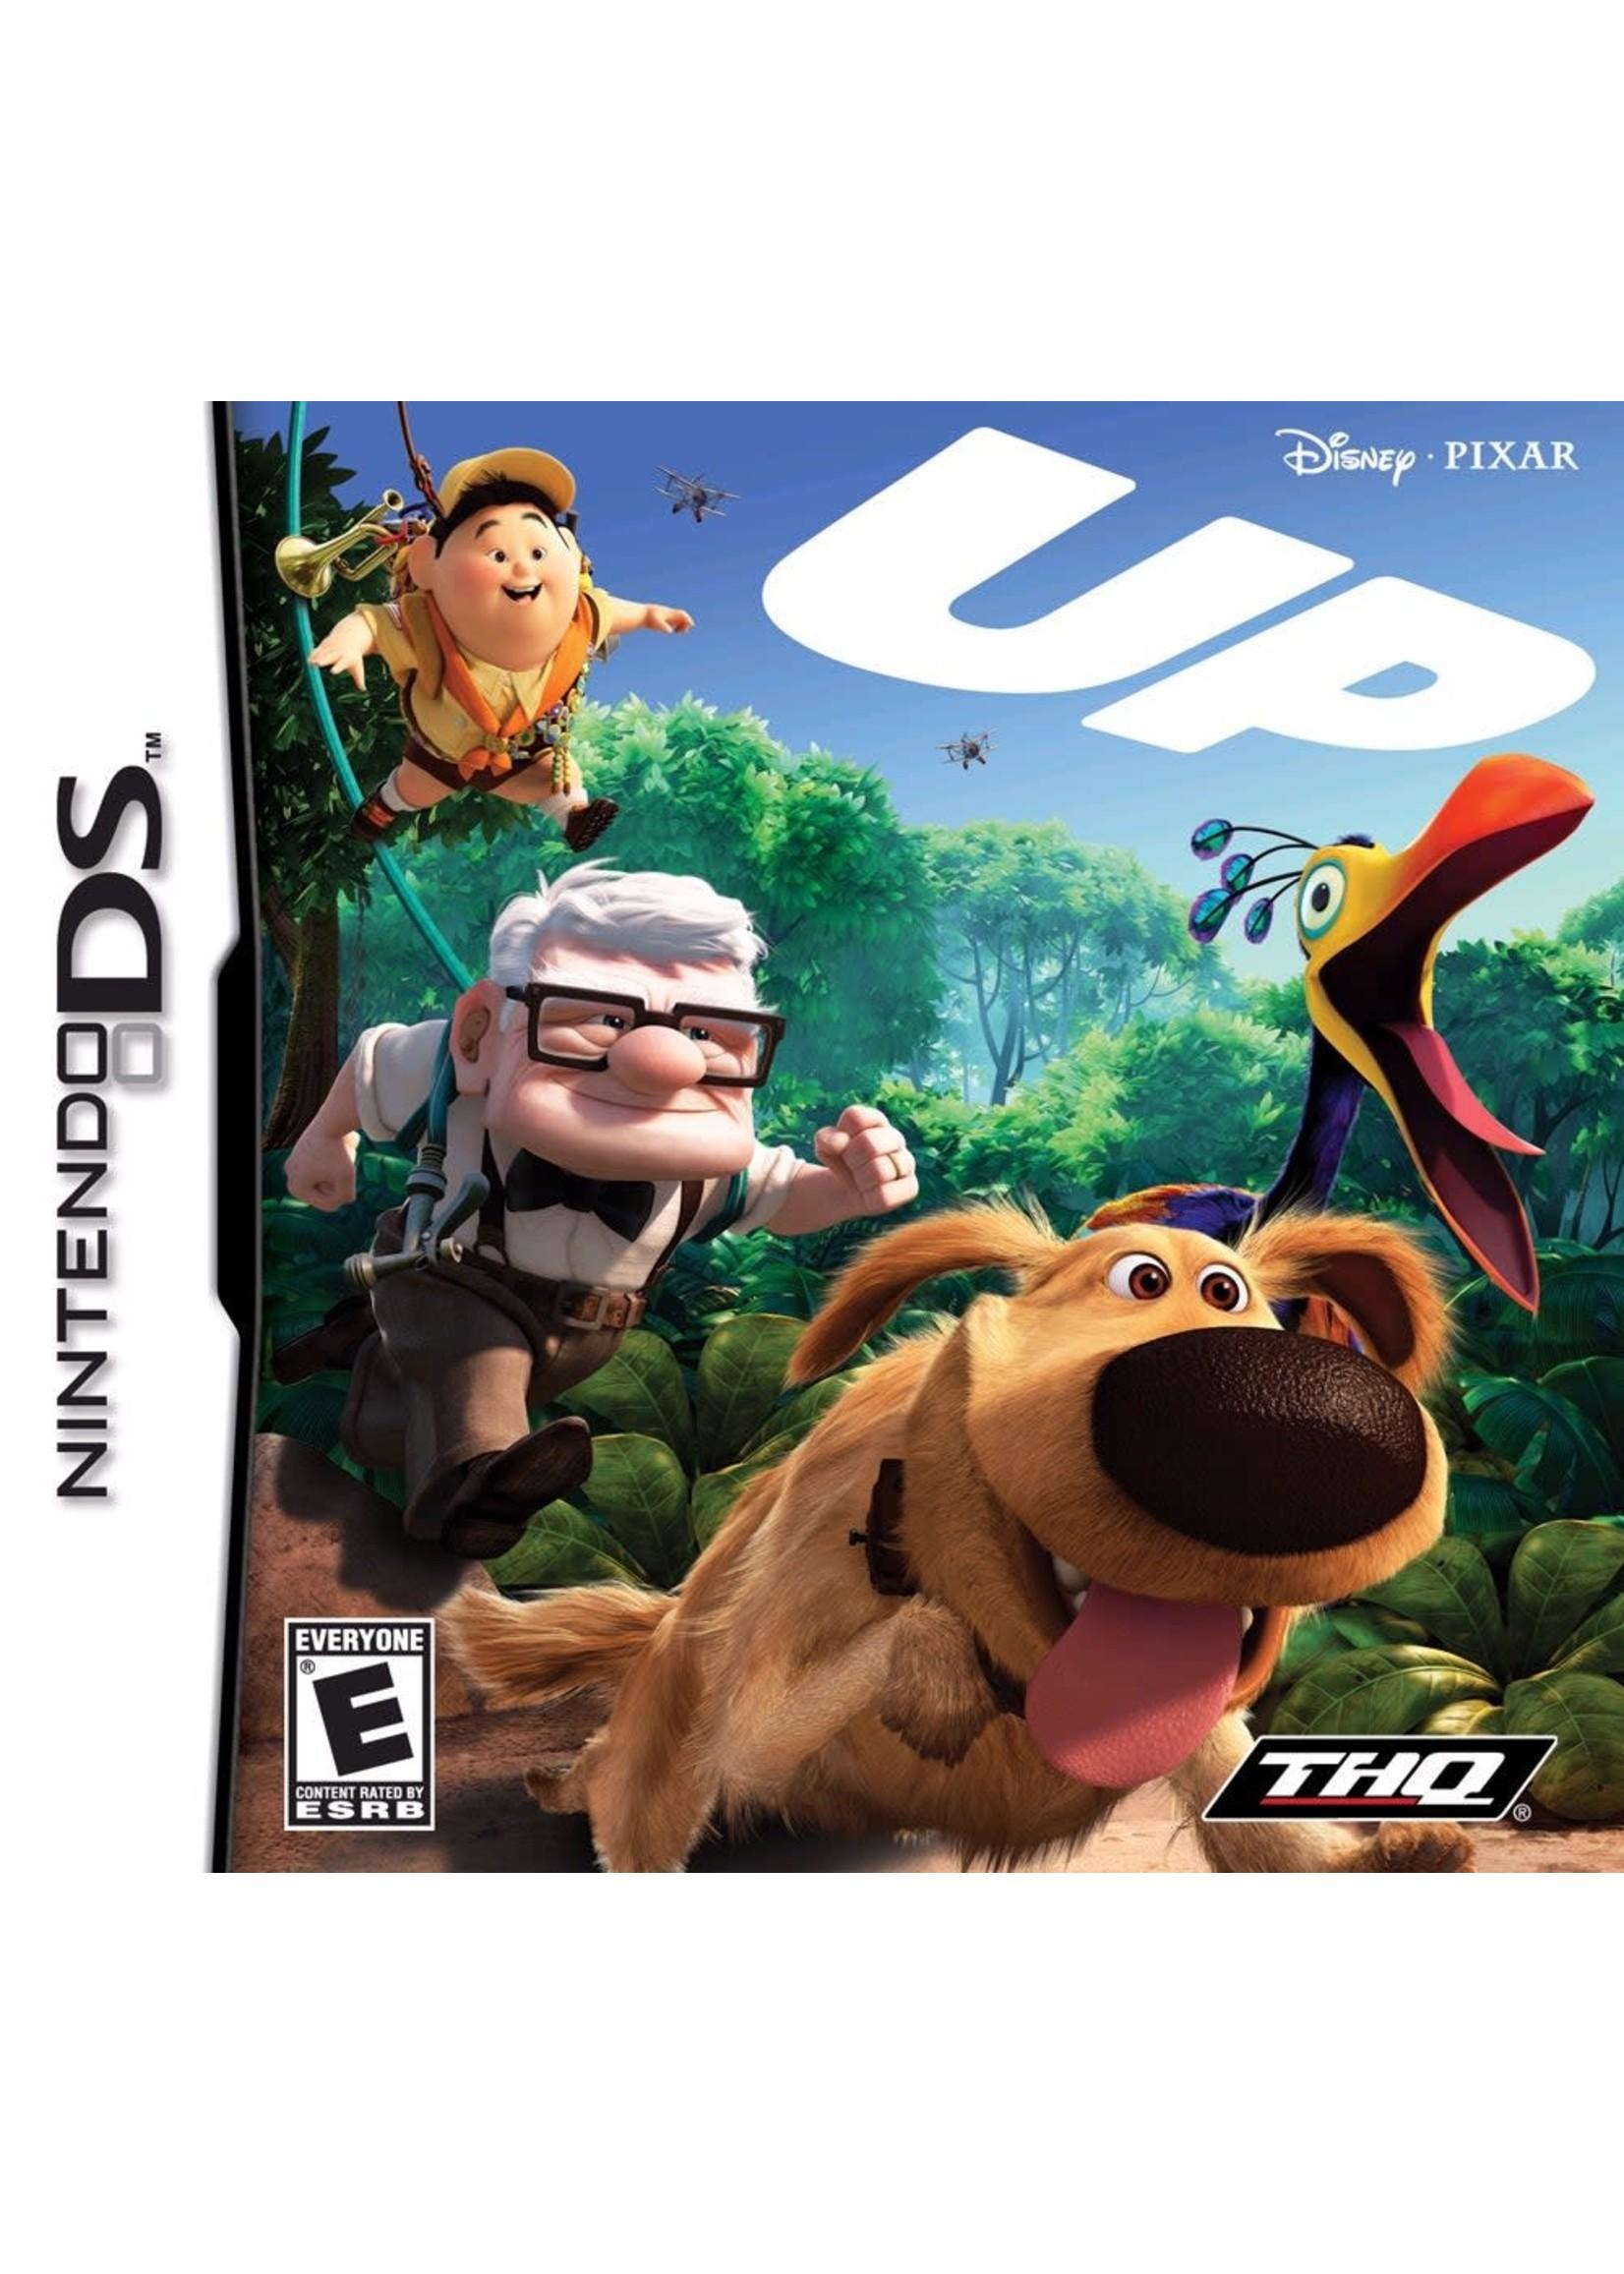 UP Nintendo DS